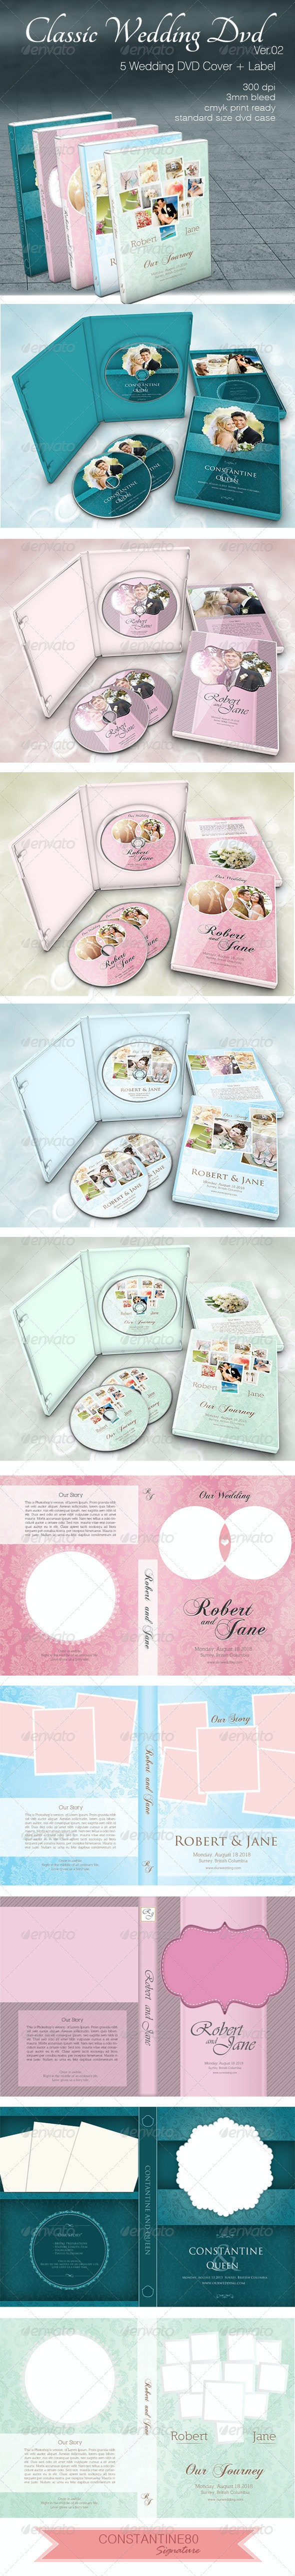 Classic Wedding Dvd ver02 - CD & DVD Artwork Print Templates